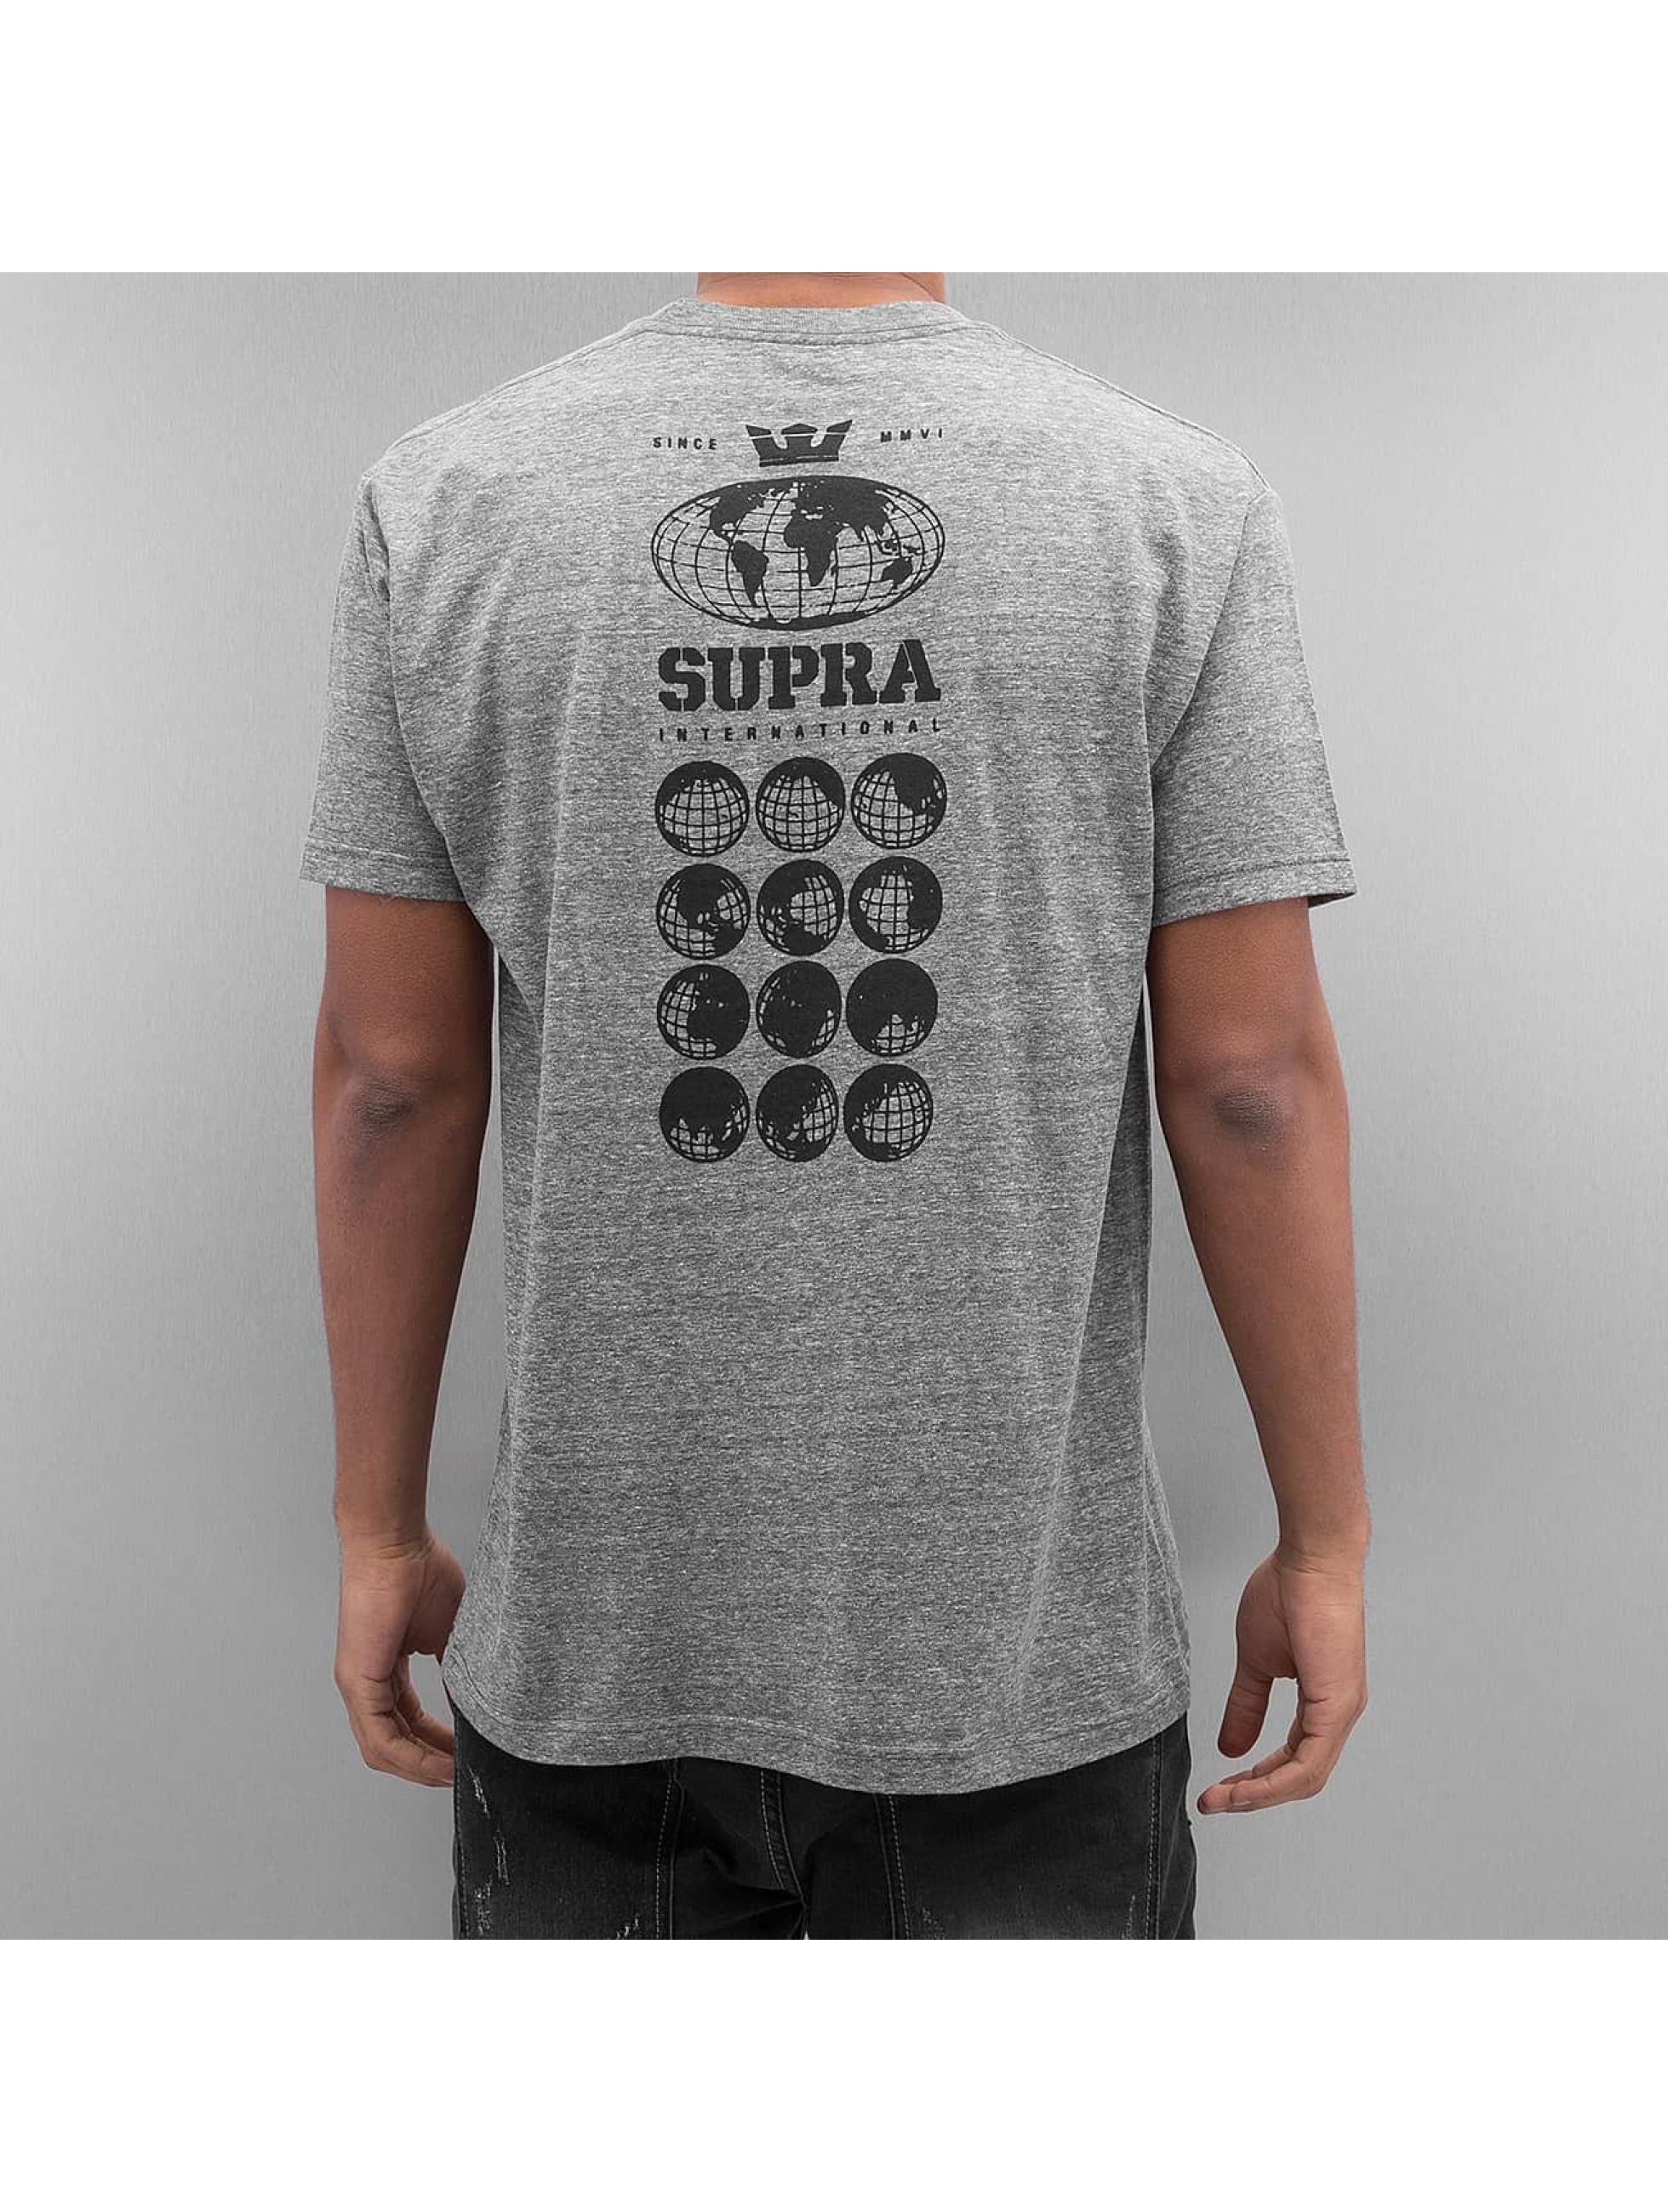 Supra T-paidat Worldwide Reg harmaa